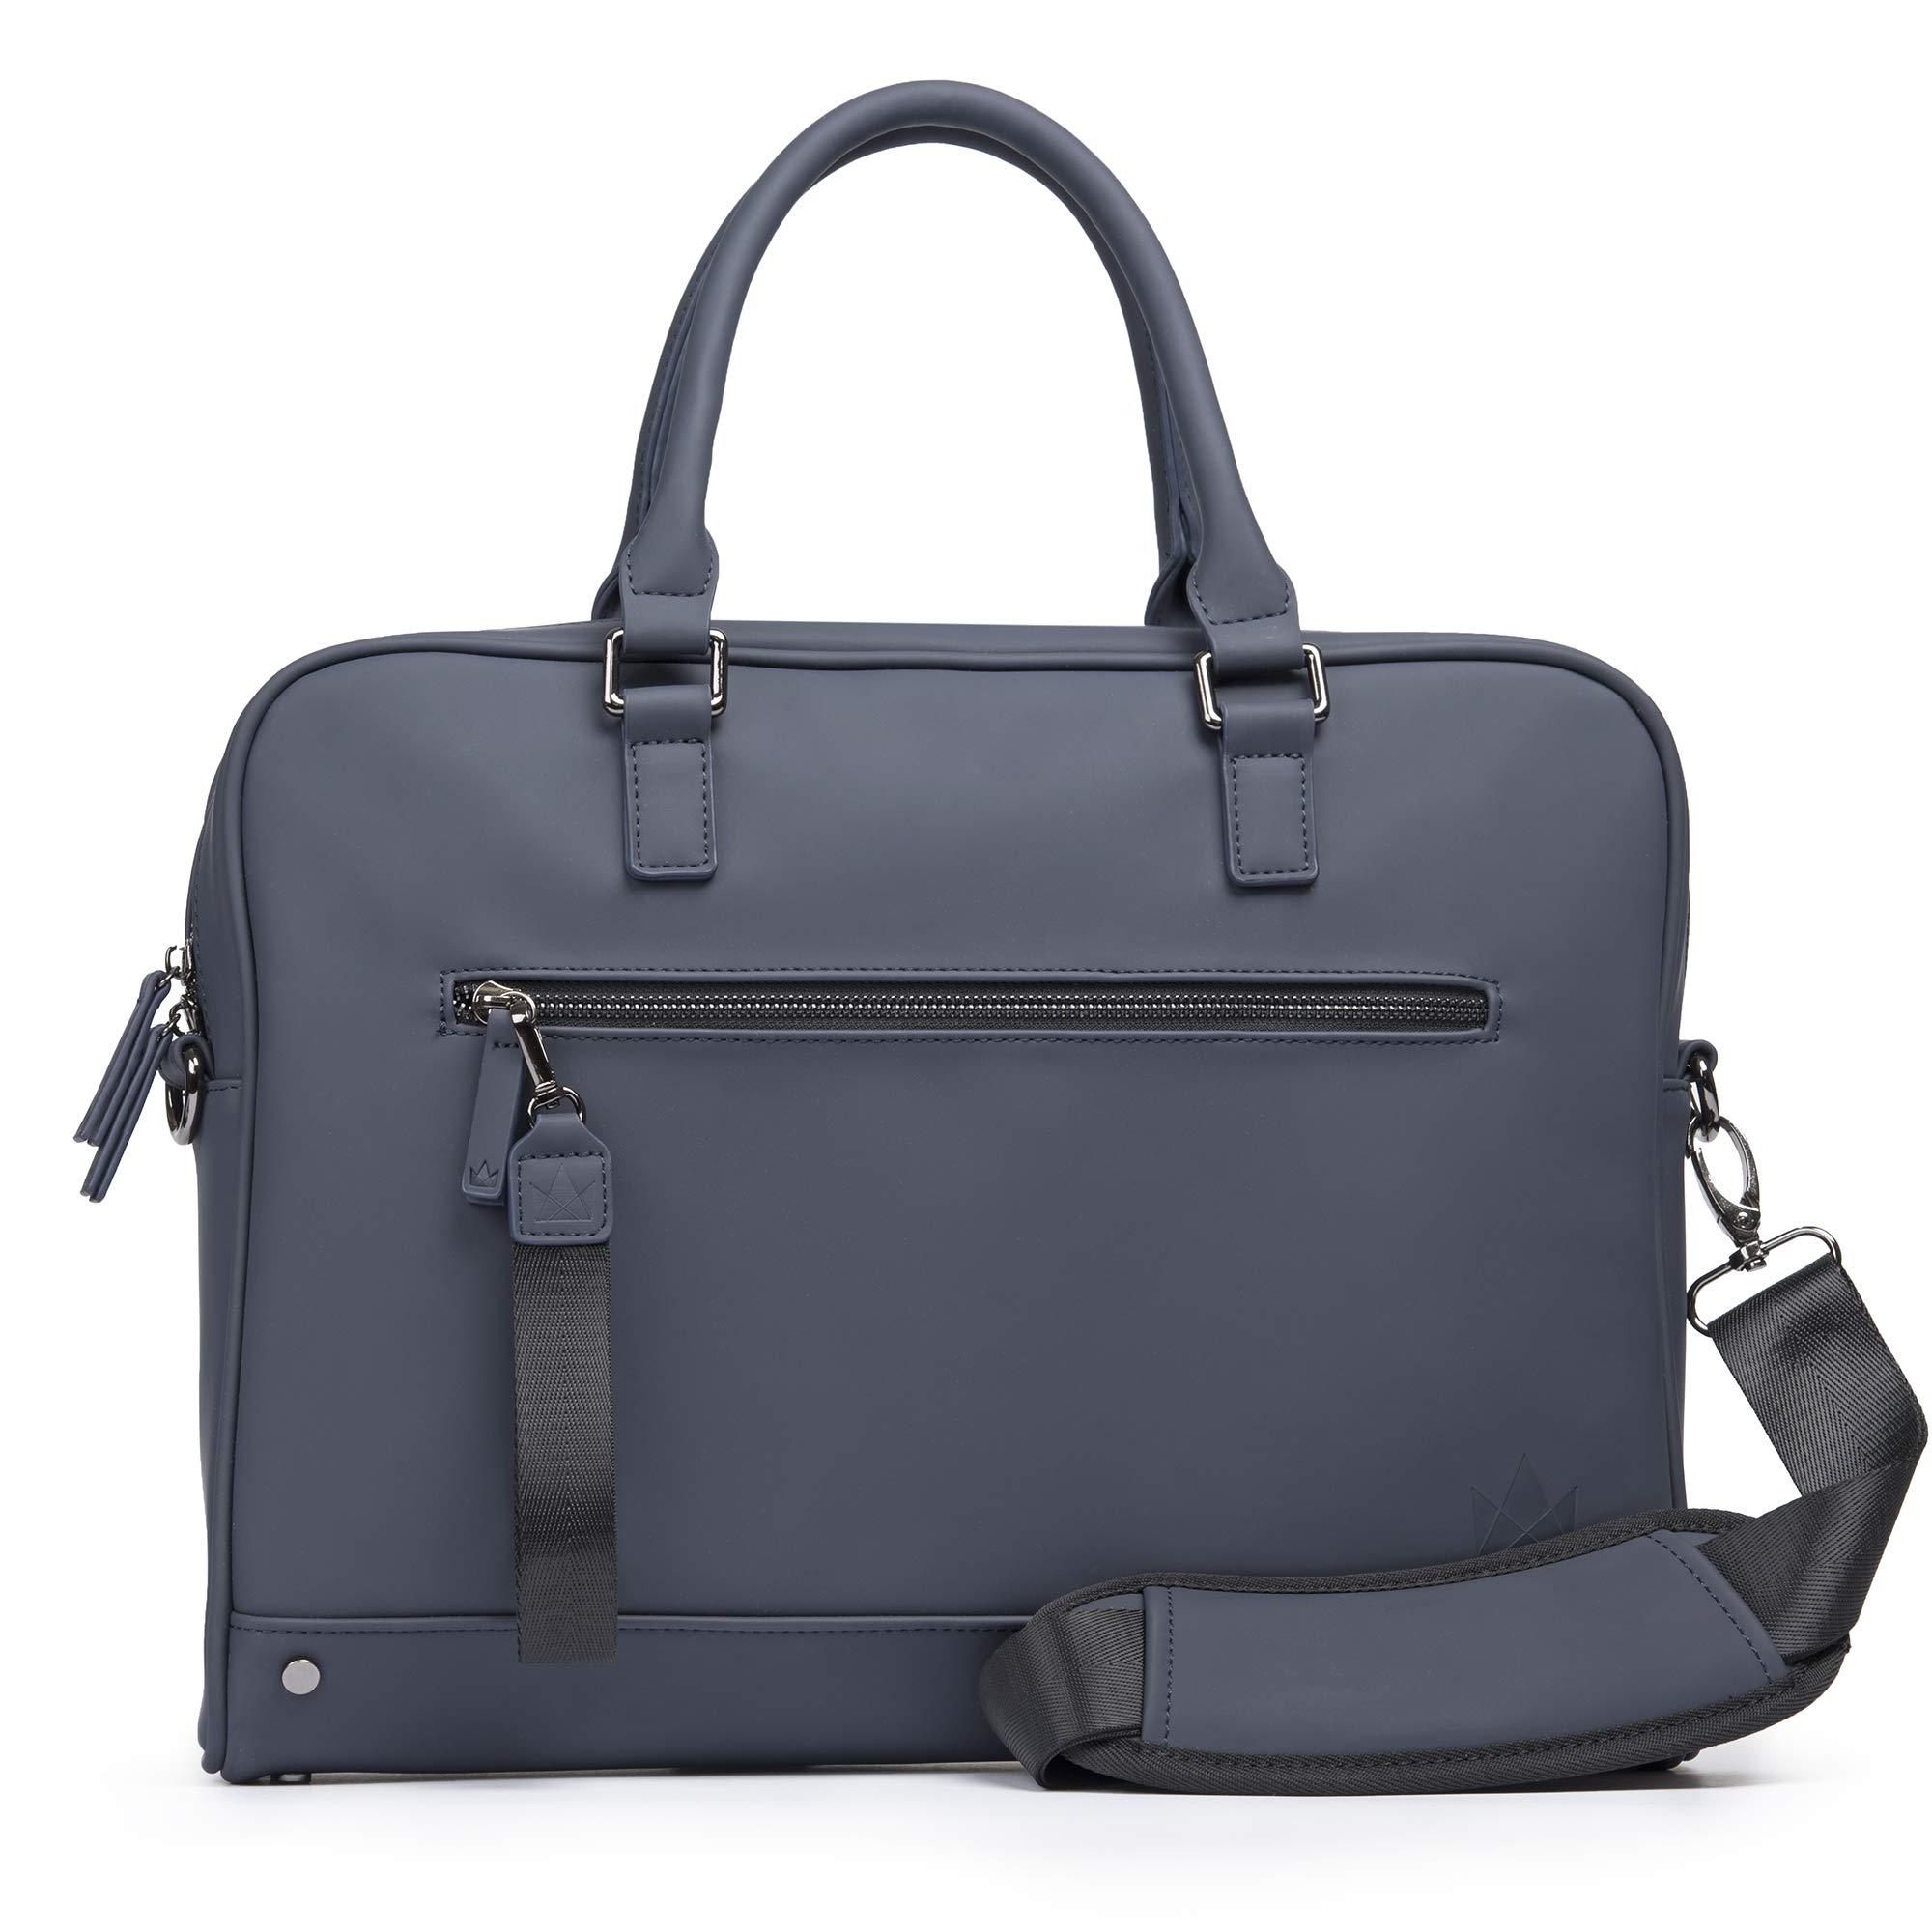 The Friendly Swede 13 inch Slim Laptop Bag for Women and Men - Shoulder Strap, Minimalist Notebook Executive Computer Case Business Briefcase, Vegan PU - VRETA